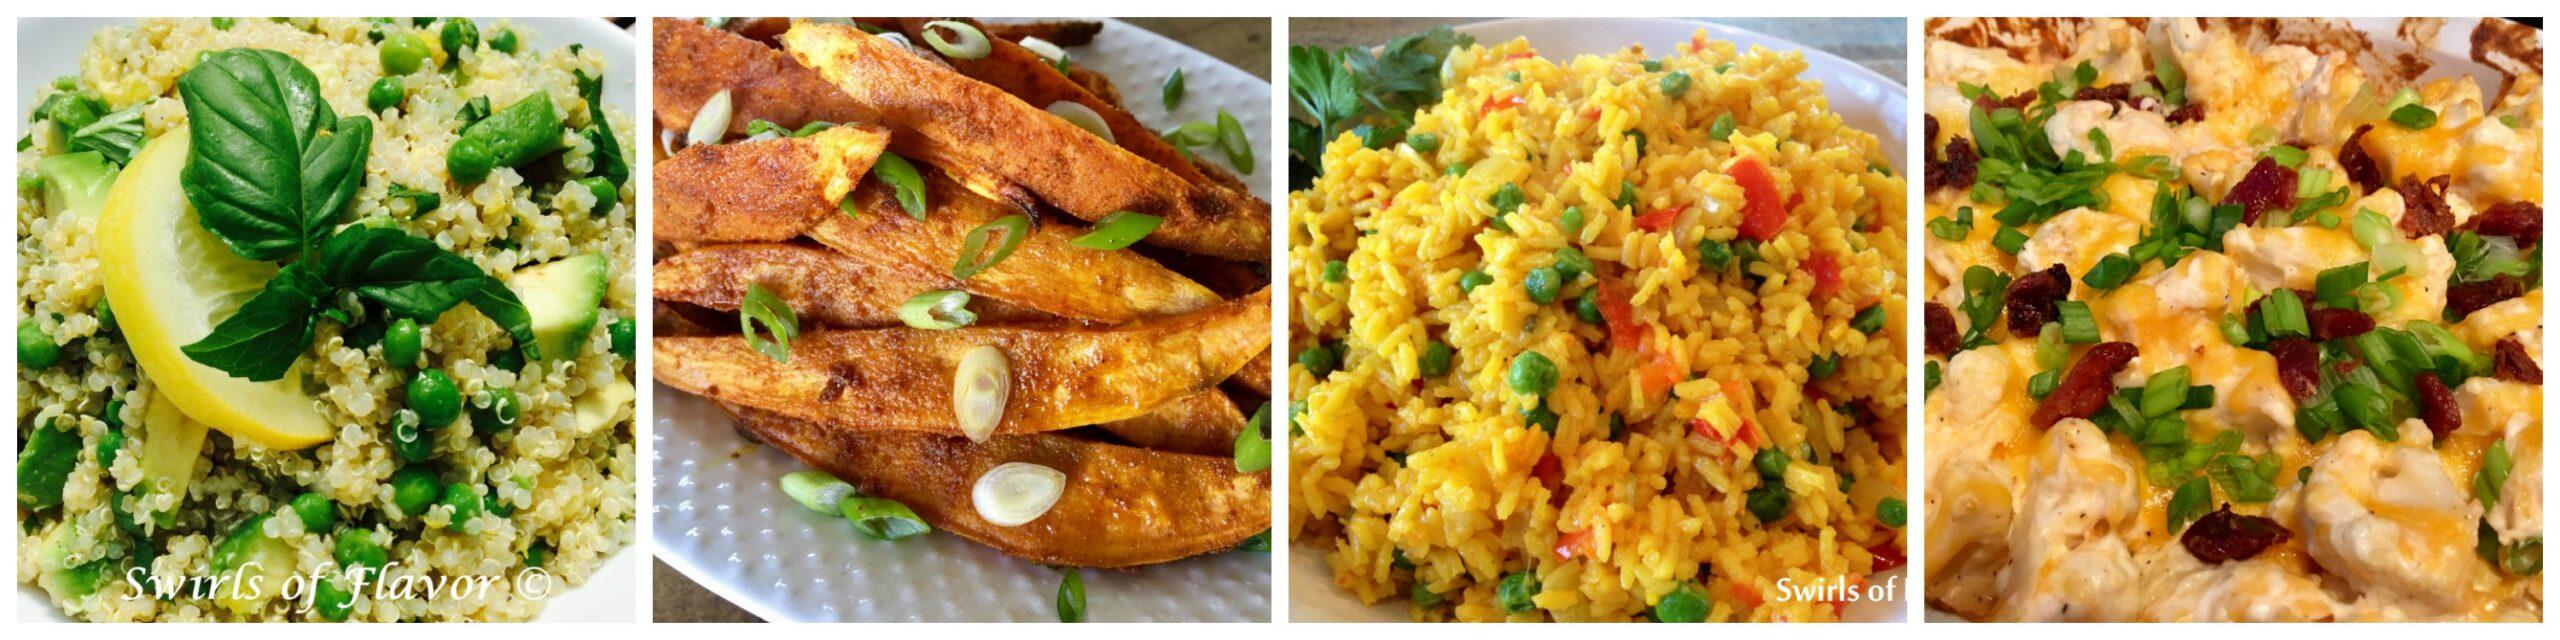 Left to right: Avocado Quinoa; Baked Sweet Potato Fries; Saffron Rice: Baked Cauliflower